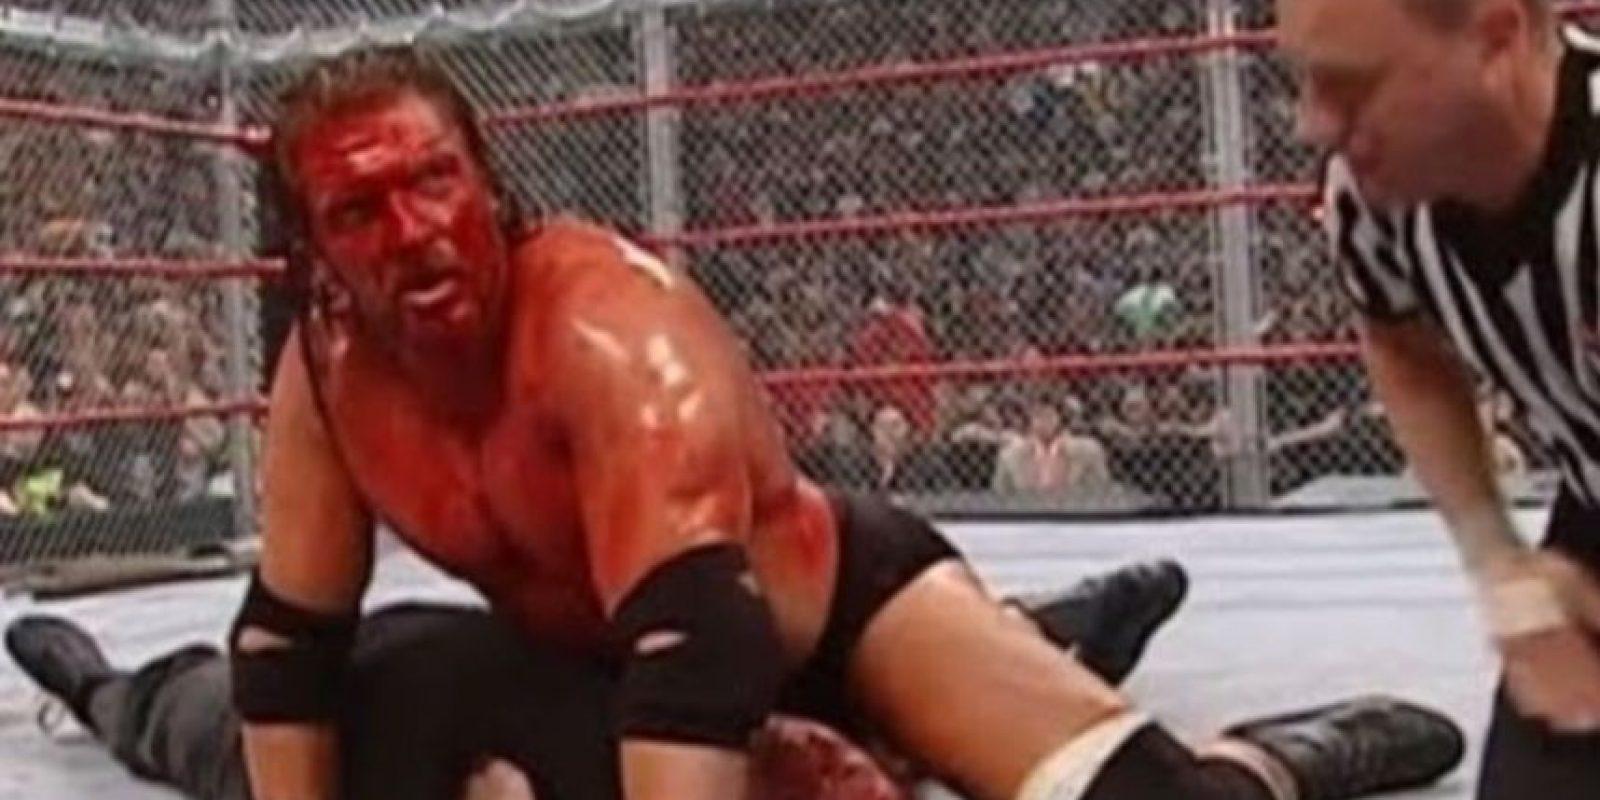 DX vs La familia McMahon y Big Show, en Unforgiven 2006. Foto:WWE